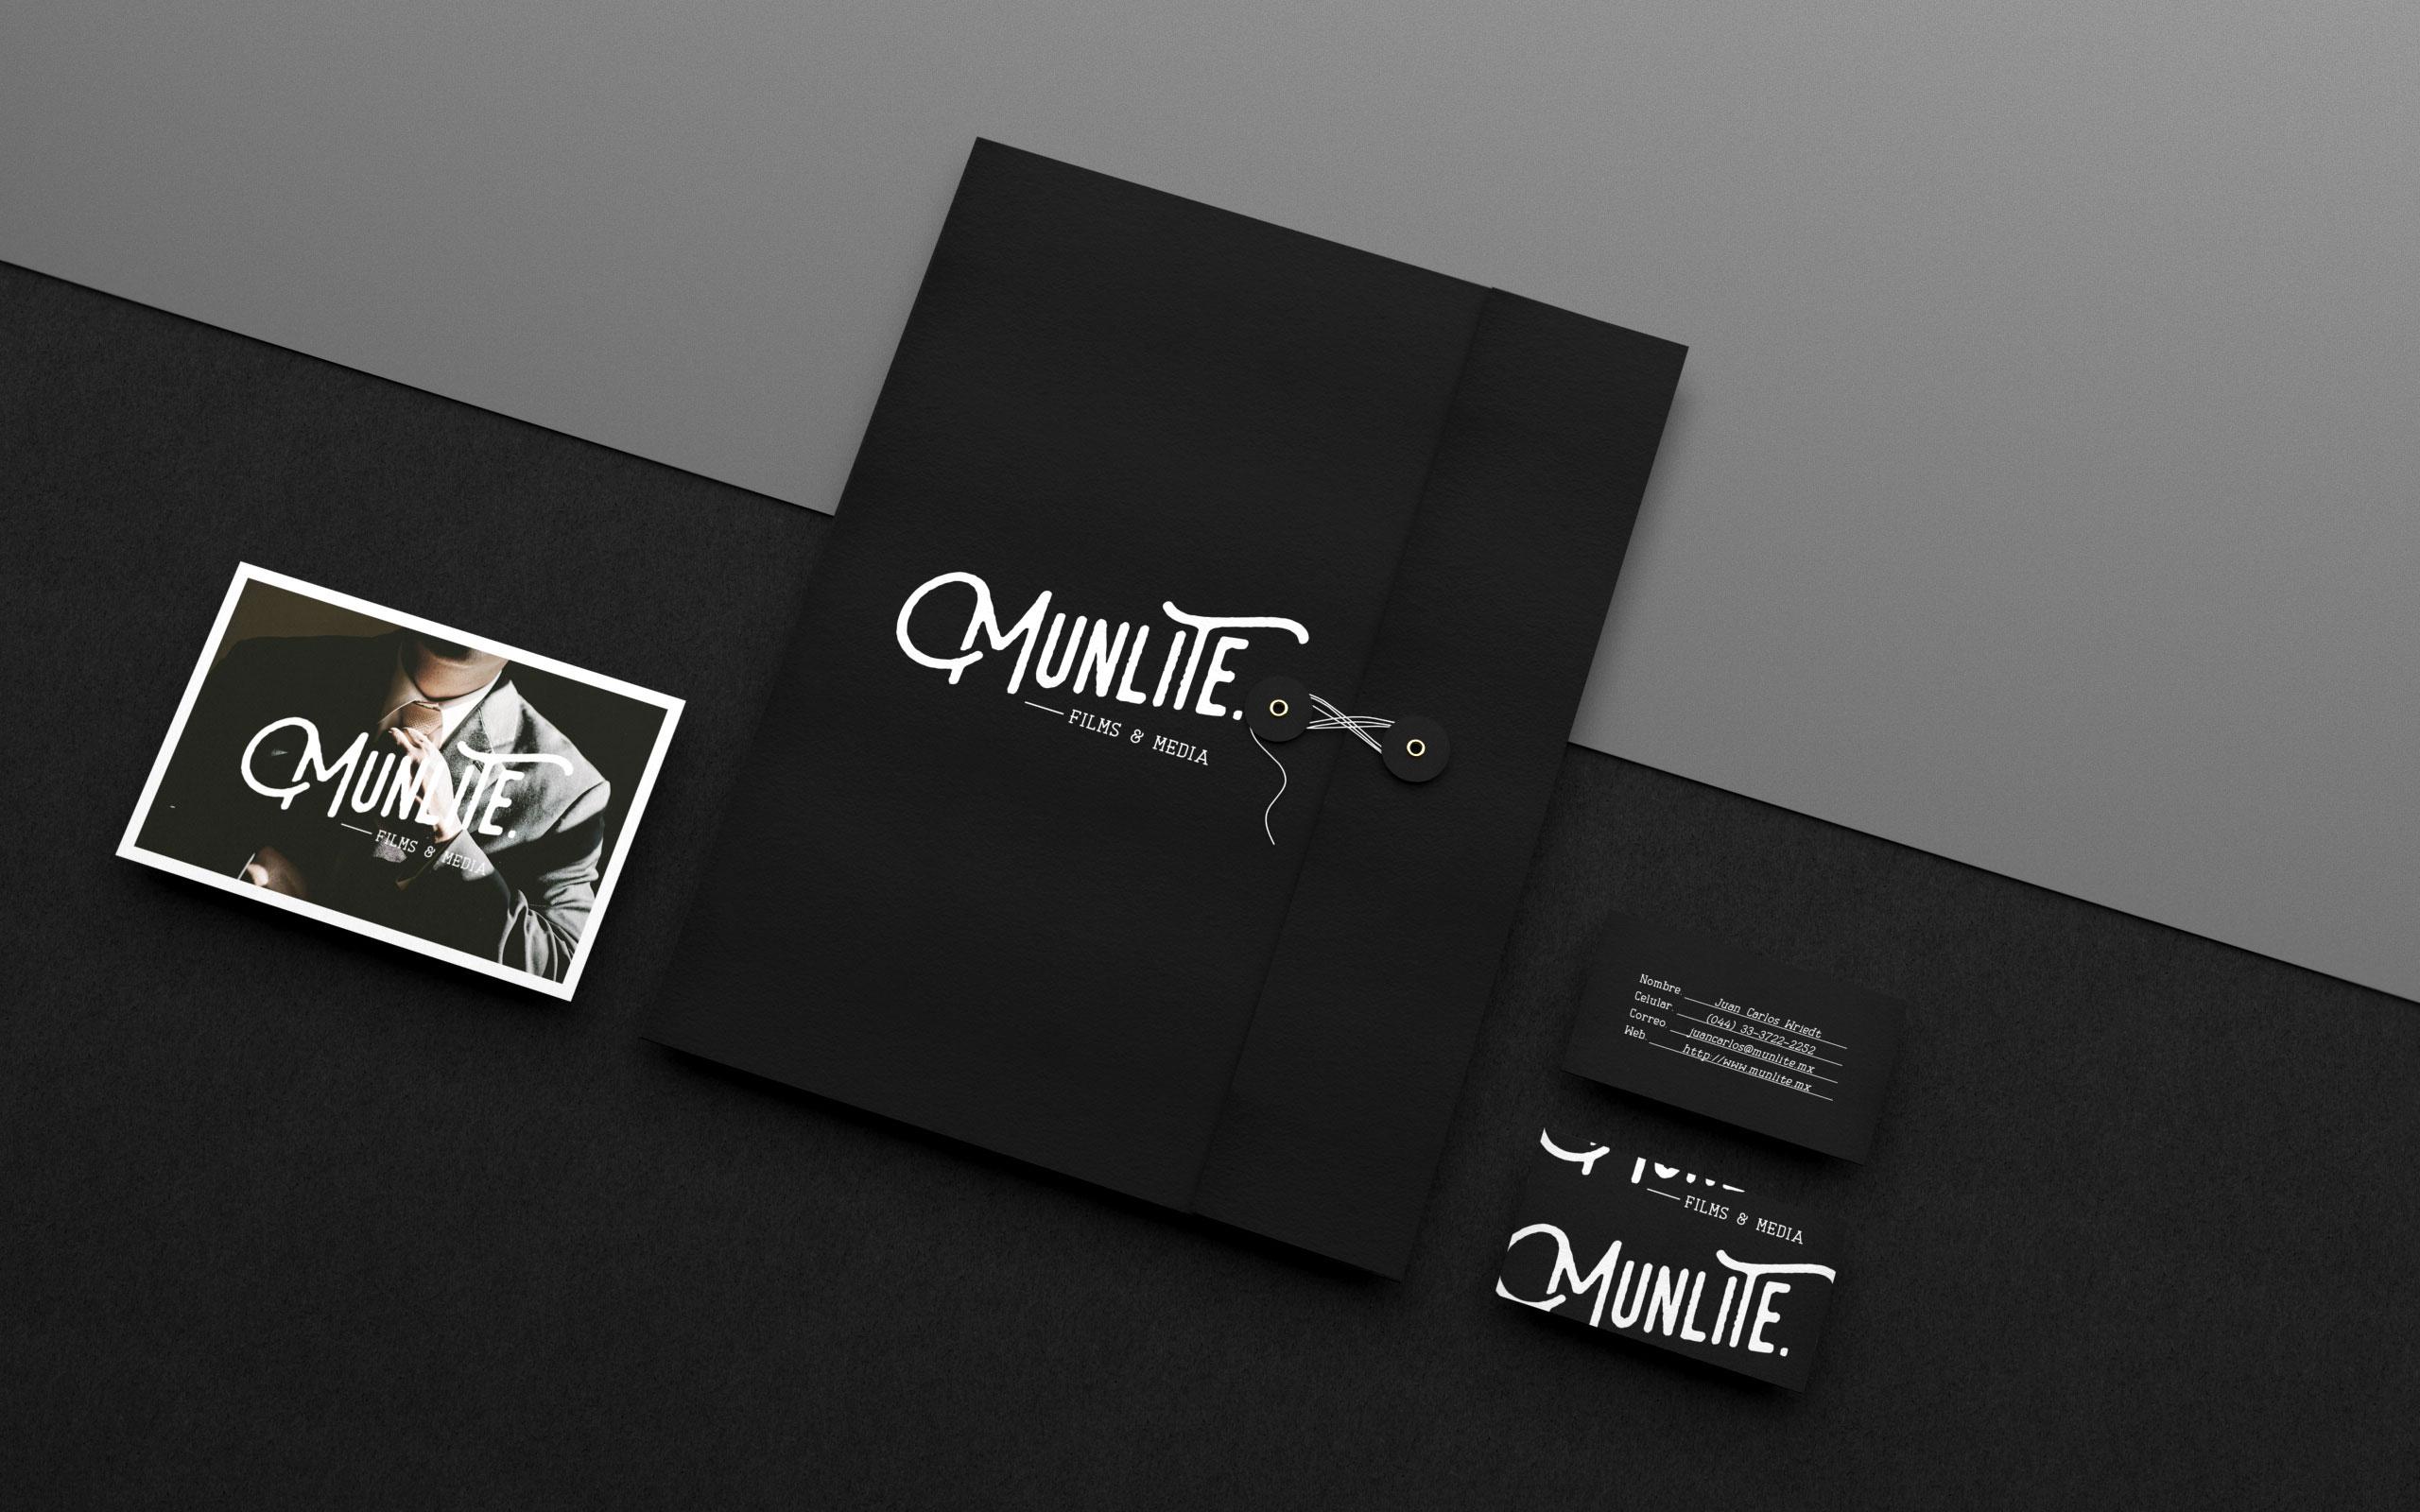 munlite-02